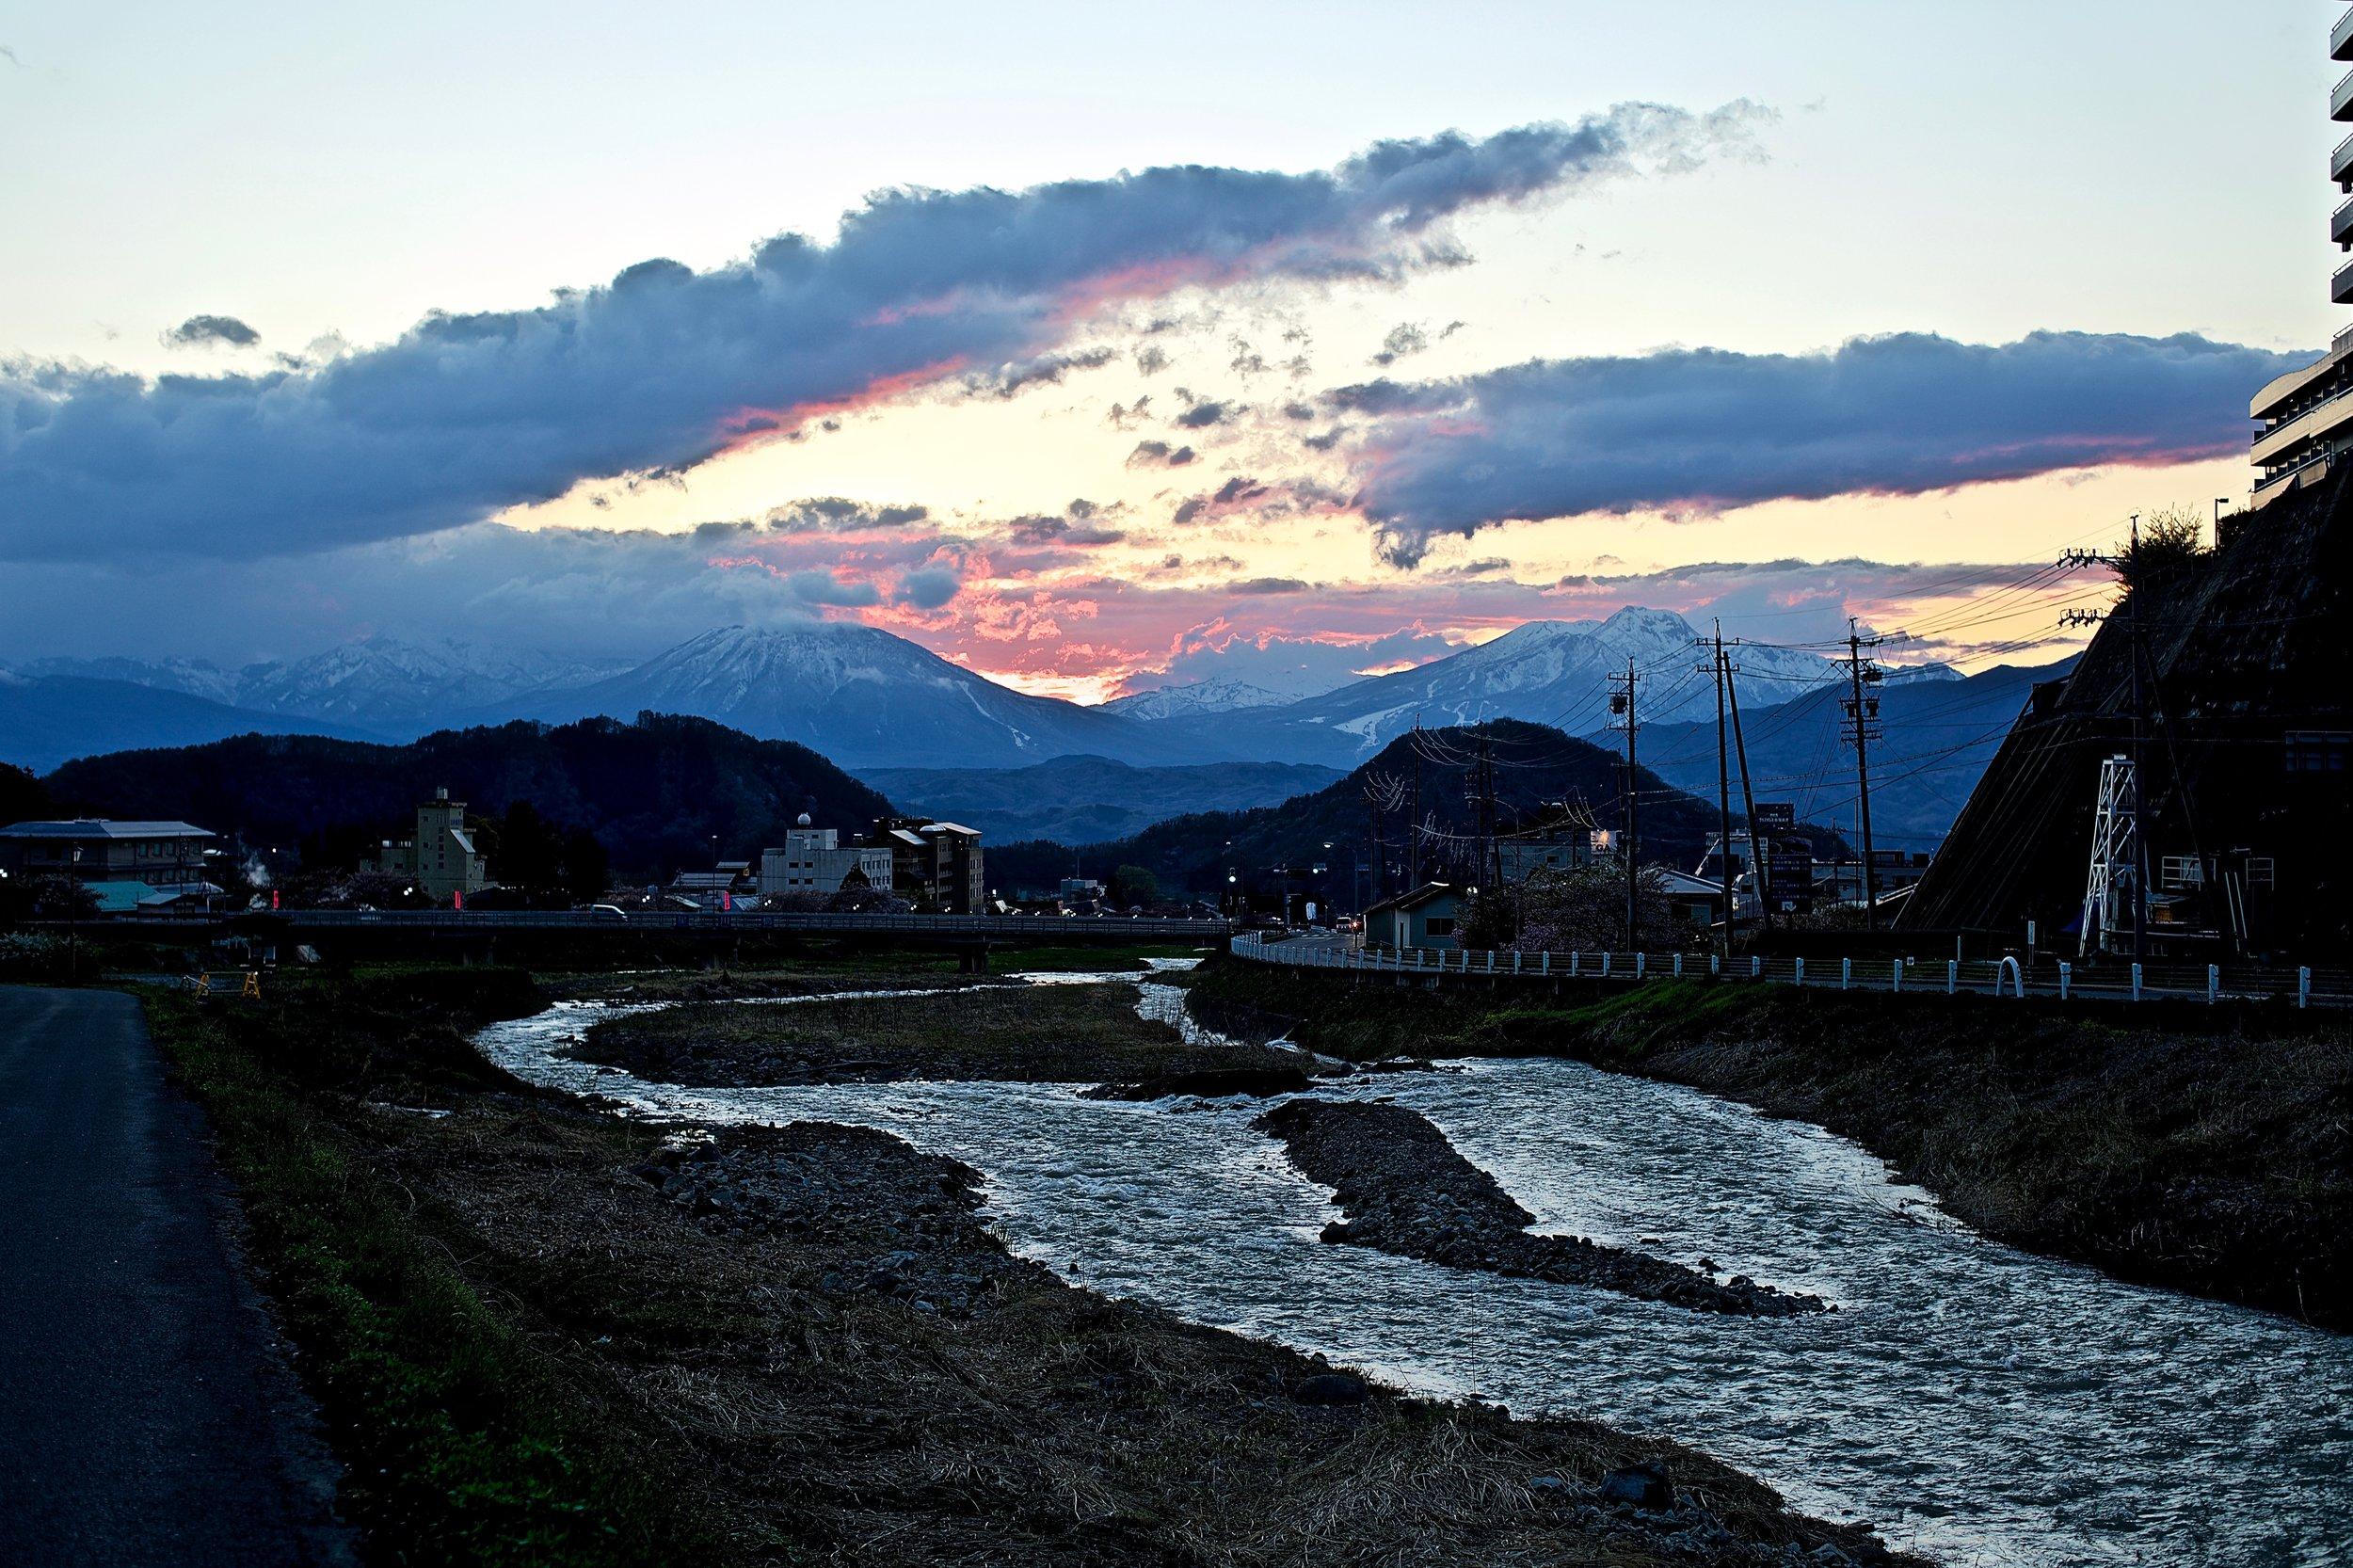 Yamanouchi, Japan